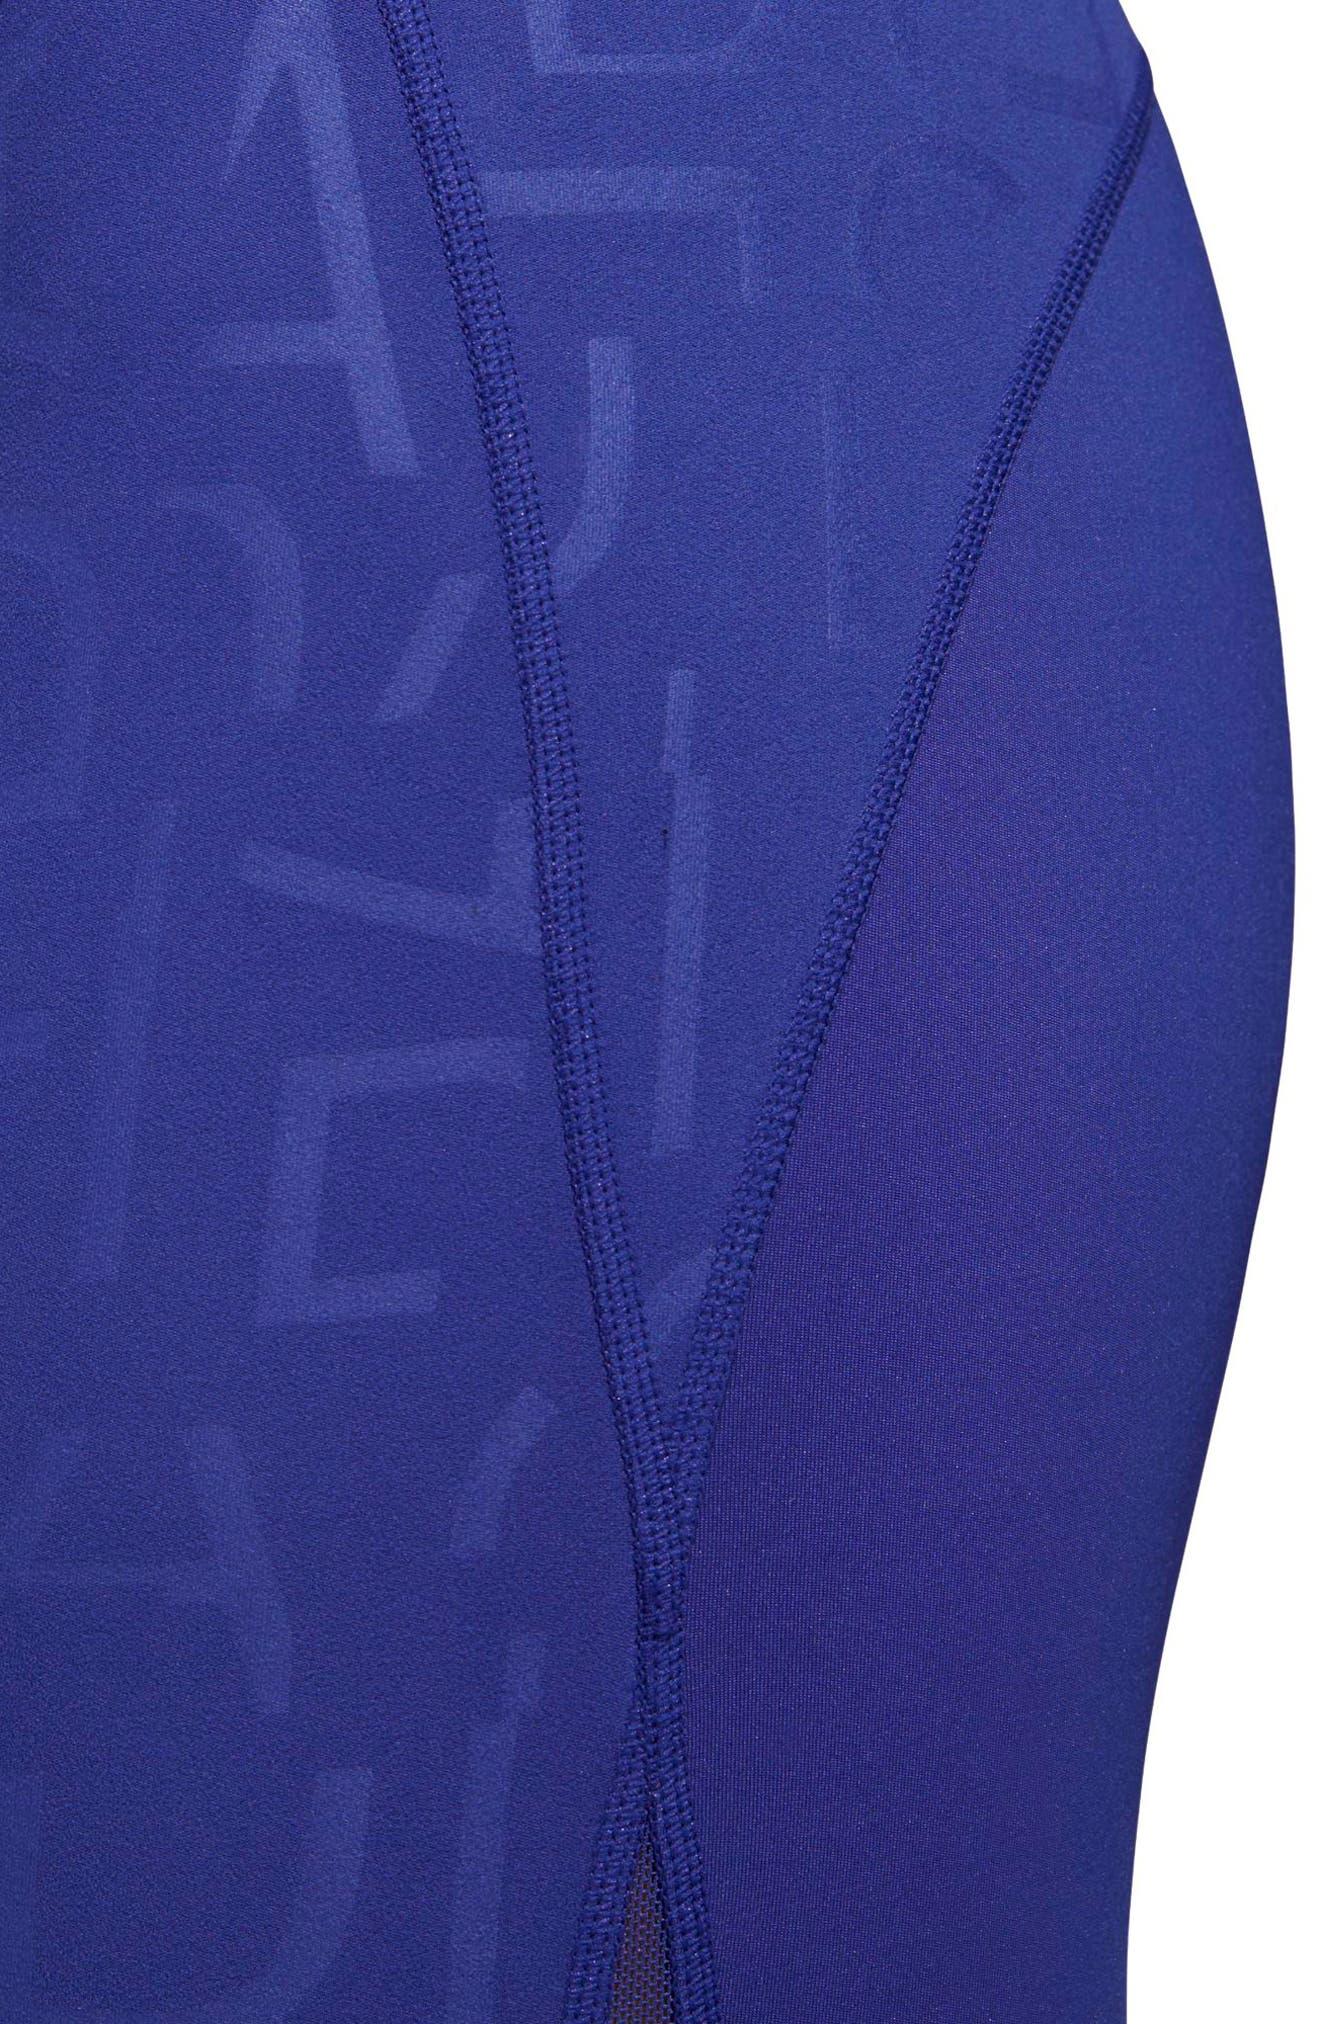 Adihack Crop Tights,                             Alternate thumbnail 7, color,                             Real Purple